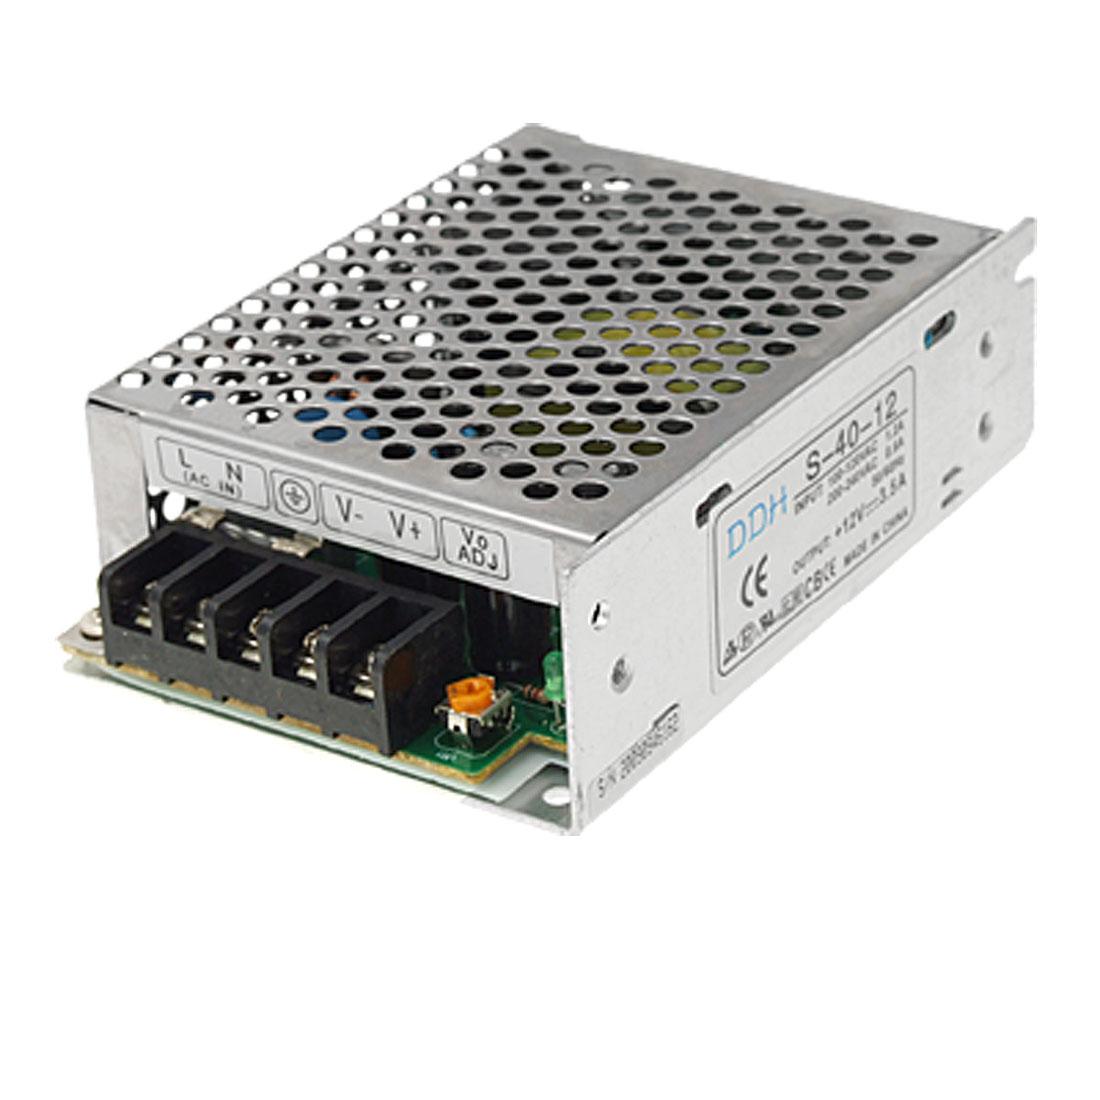 AC 110-220V DC 12V 3.5A 42w Switch Power Supply Transformer Driver for LED Strip Light